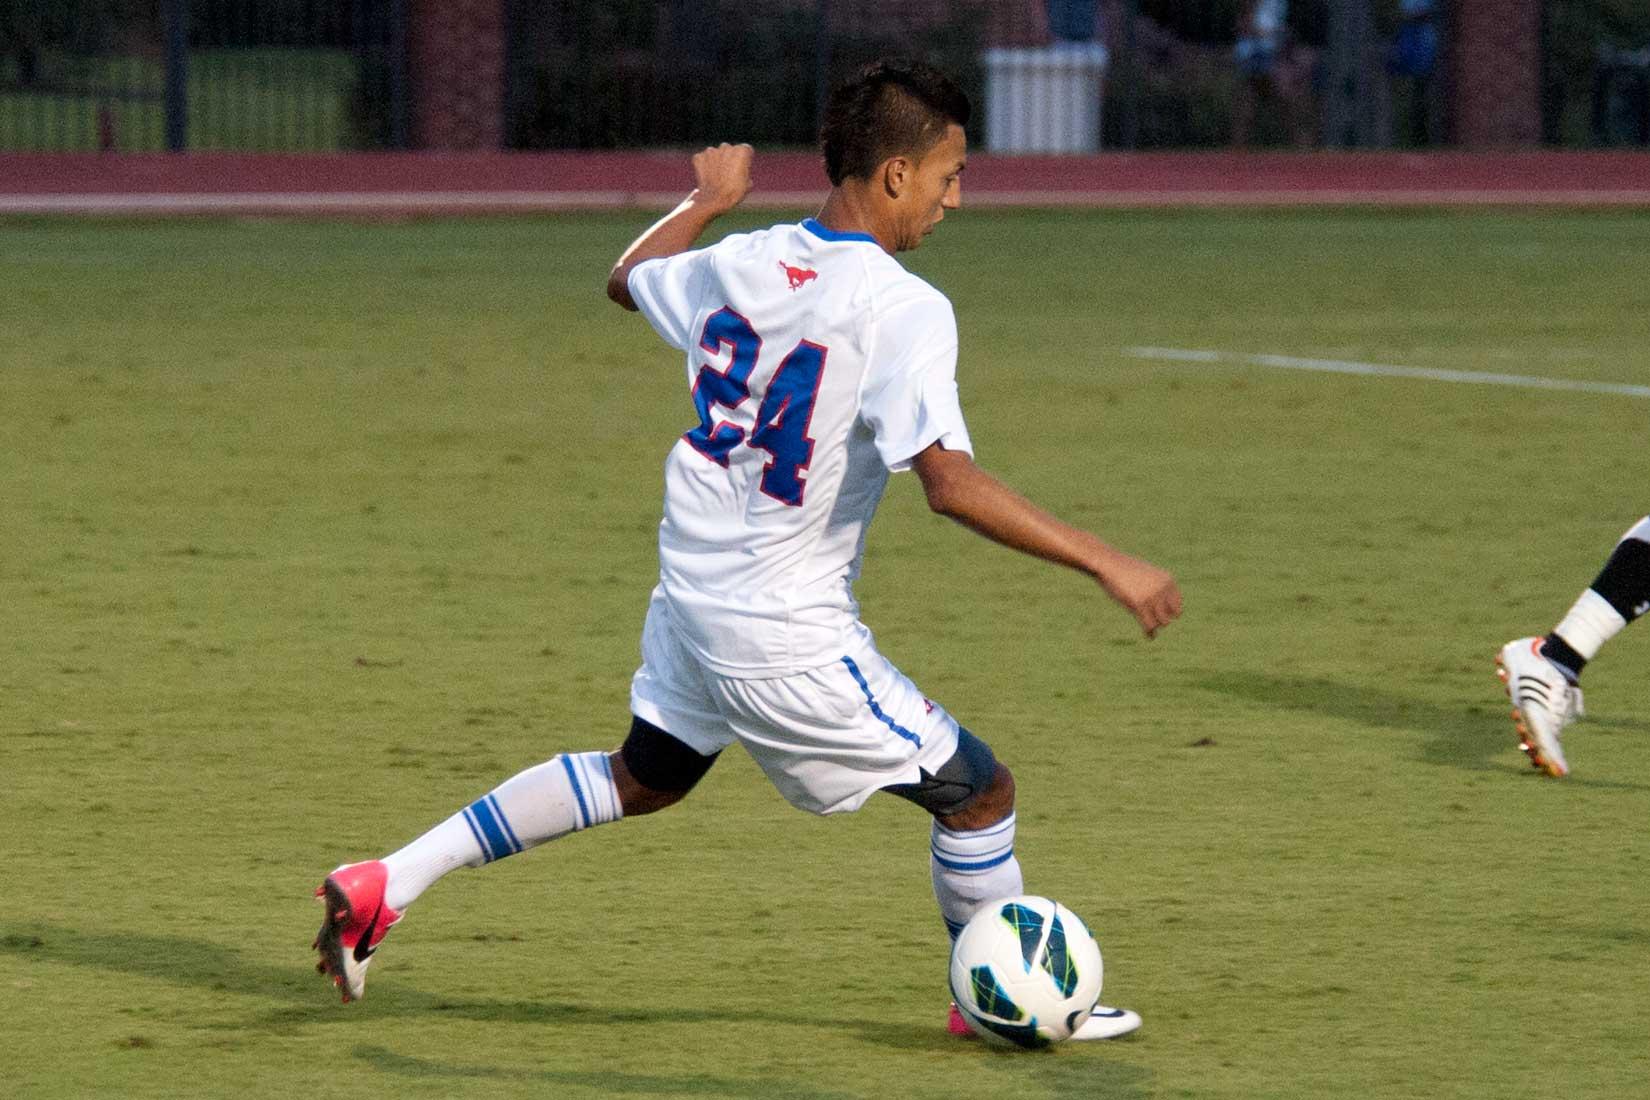 SMU Soccer vs. Campbell Soccer 24